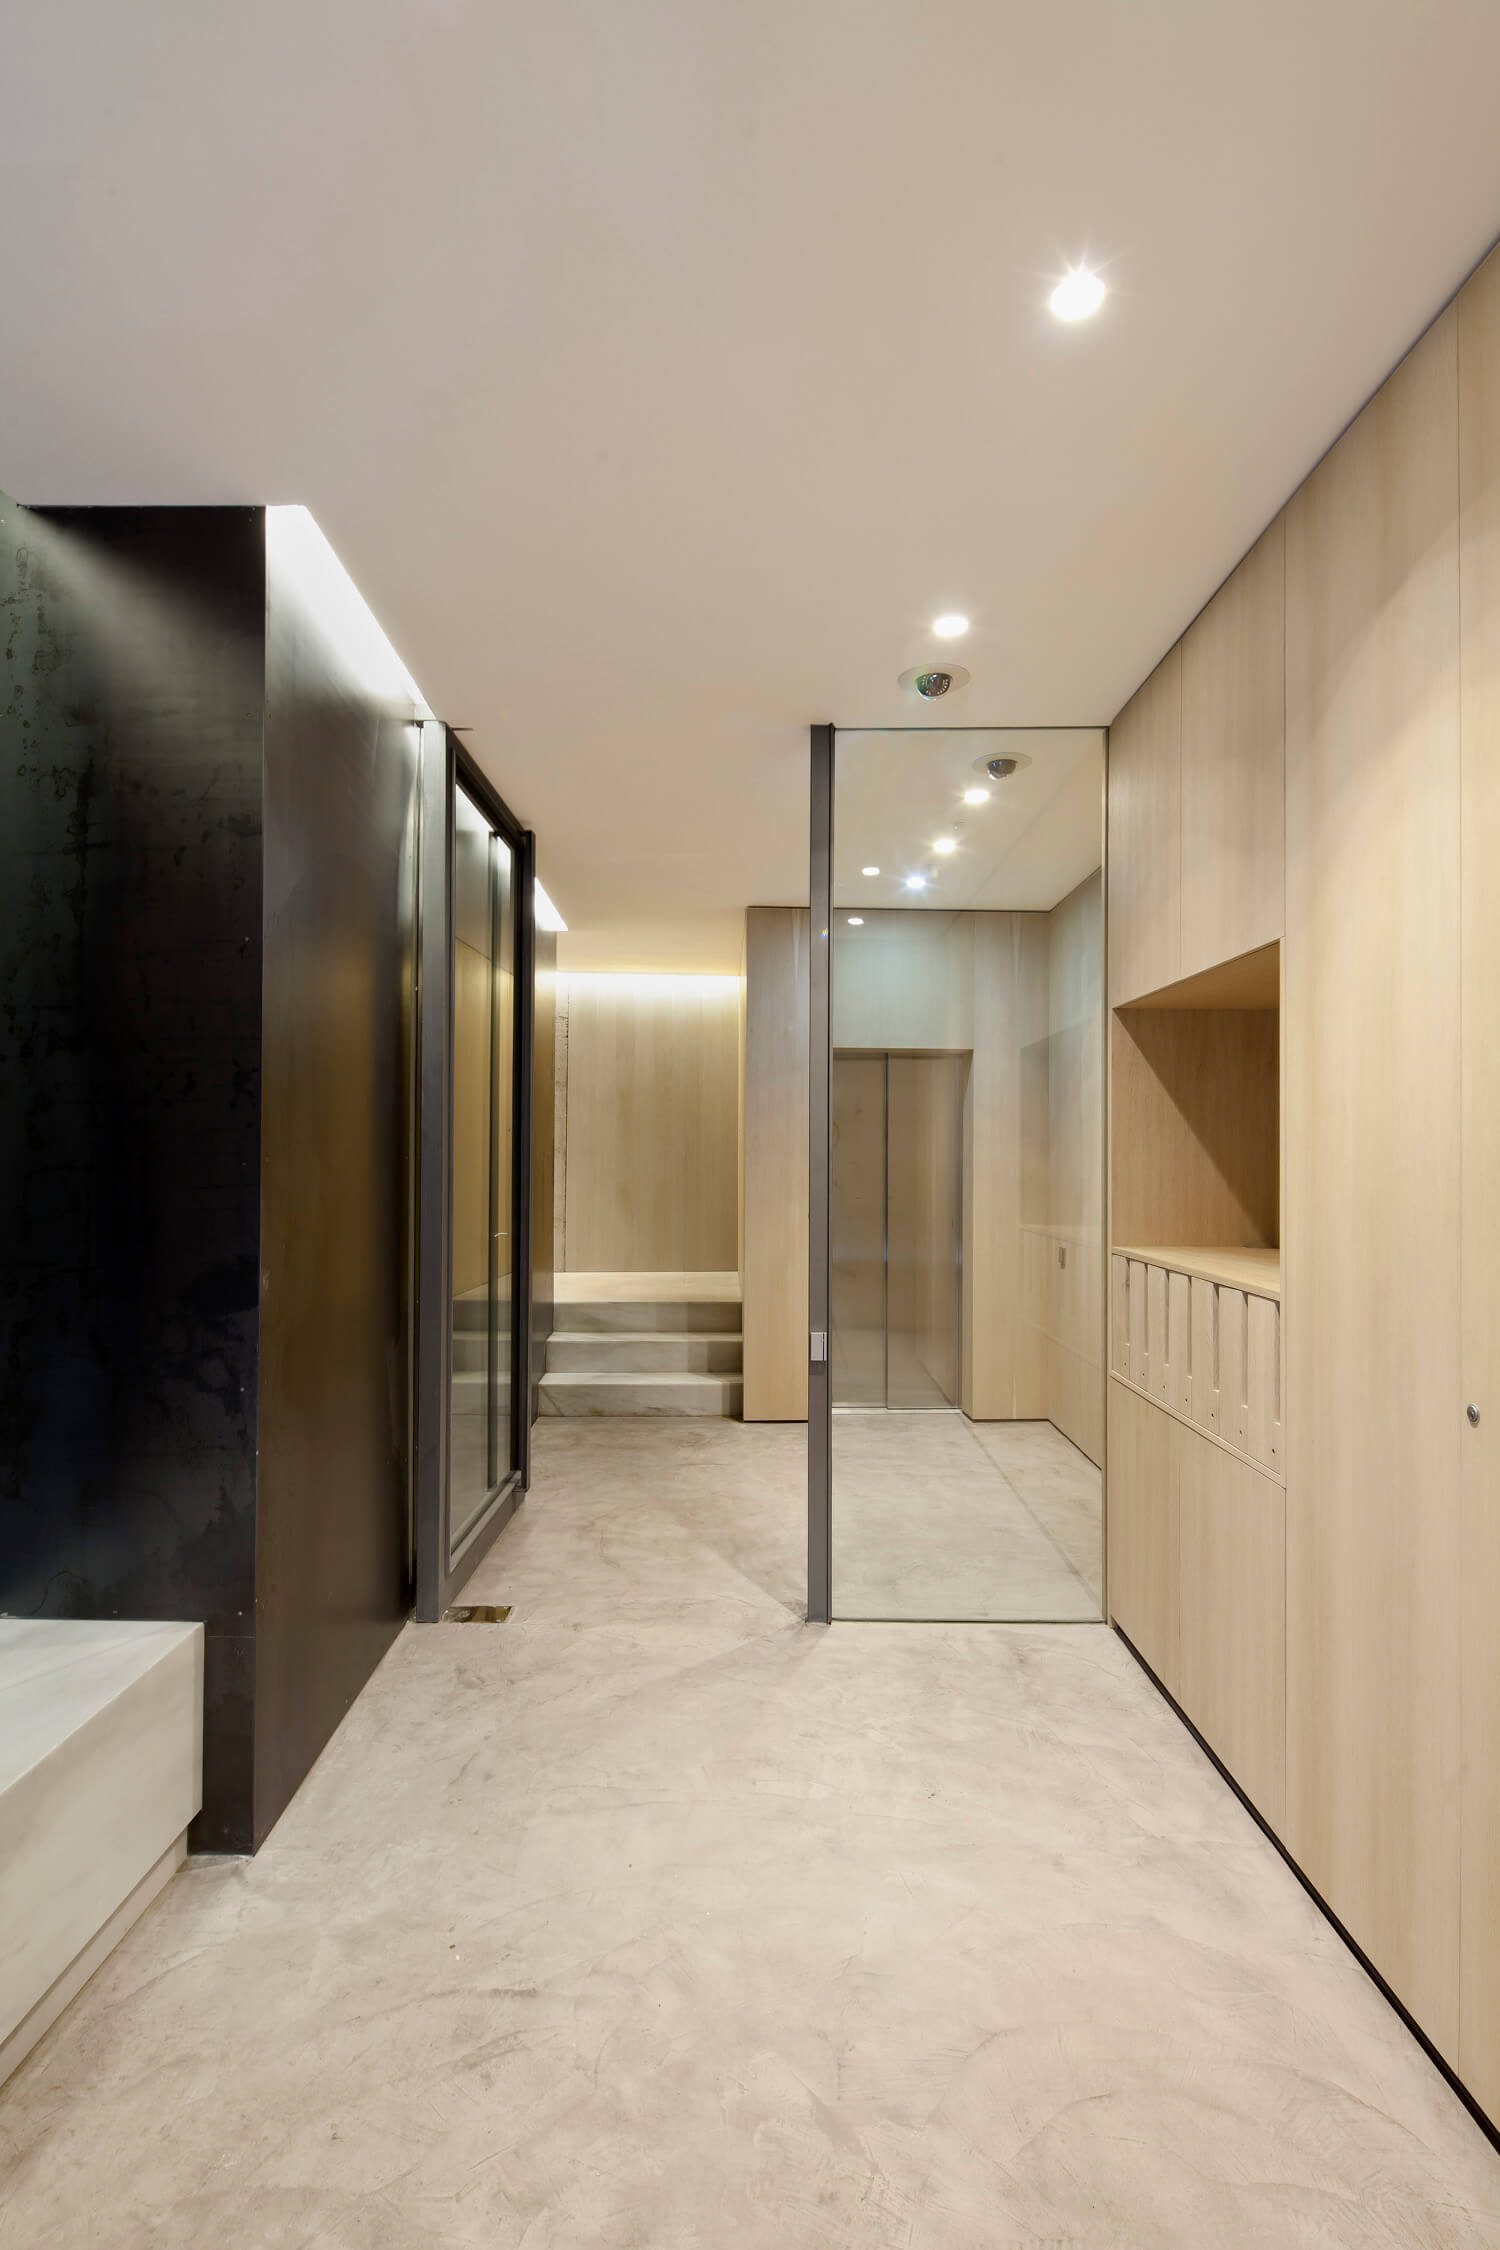 planell-hirsch_arquitectura_rehabilitacion_interiorismo_barcelona_born_mirallers_vestibulo_adriagoula_2963